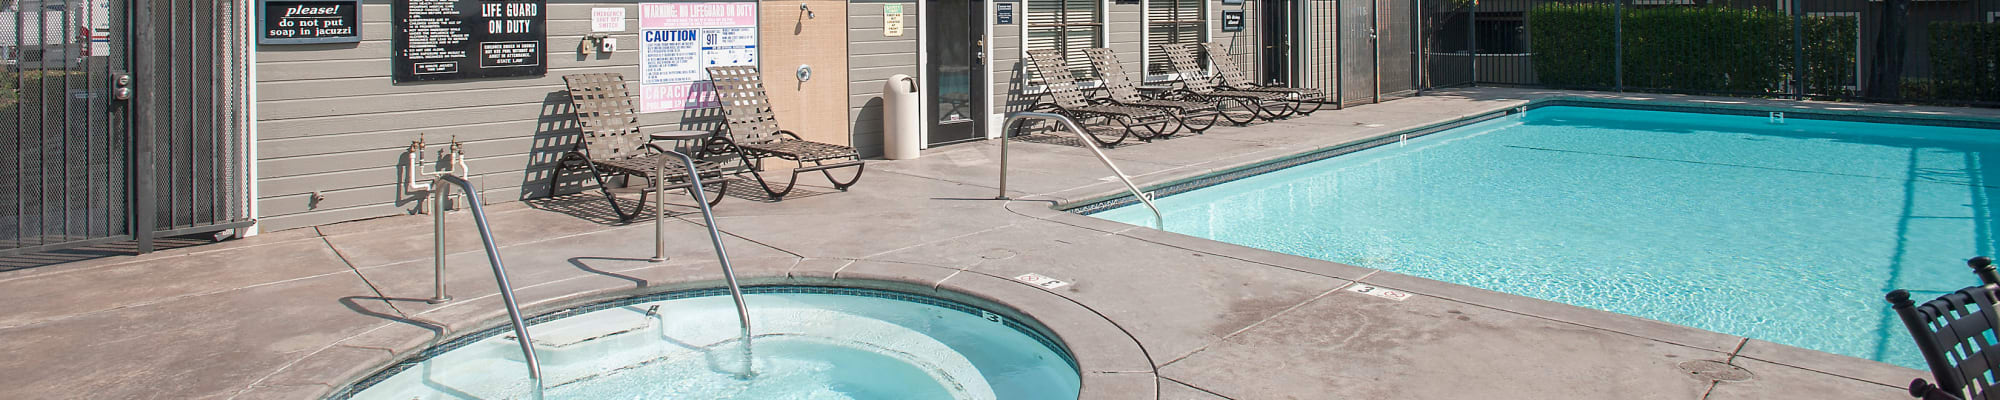 Amenities at Sandpiper Village Apartment Homes in Vacaville, California